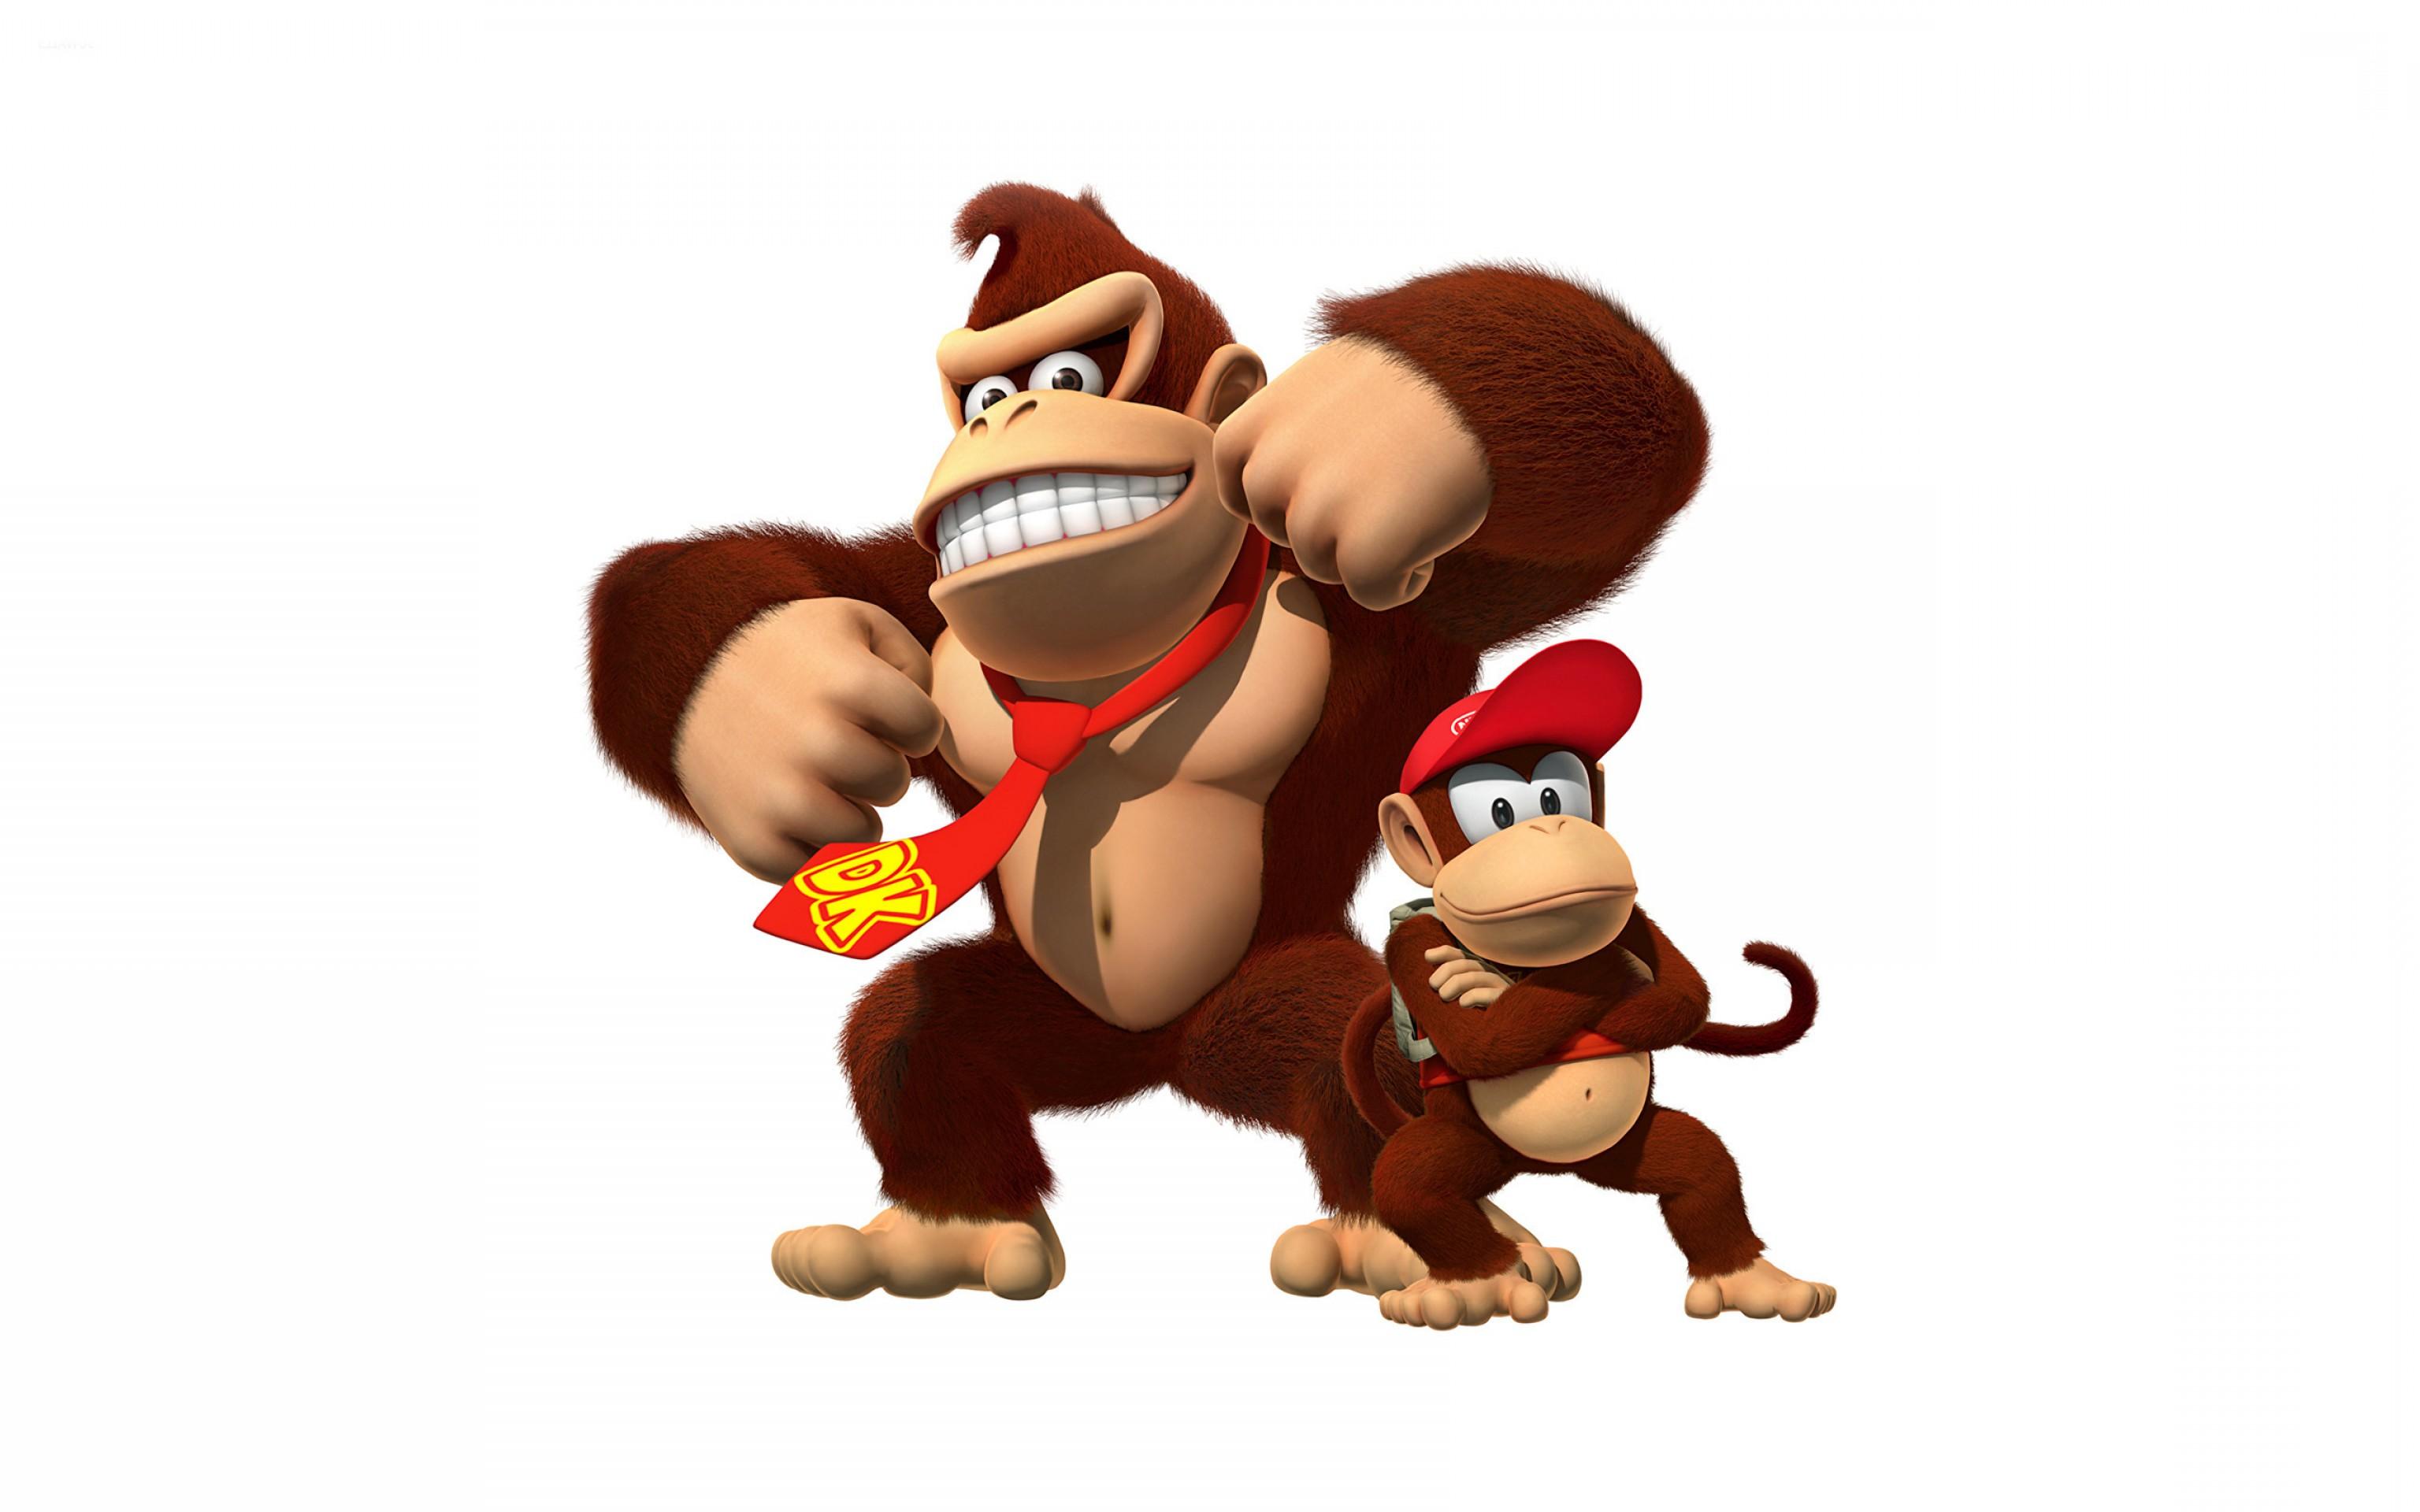 3072x1920 Donkey Kong Vector Geekchicpro